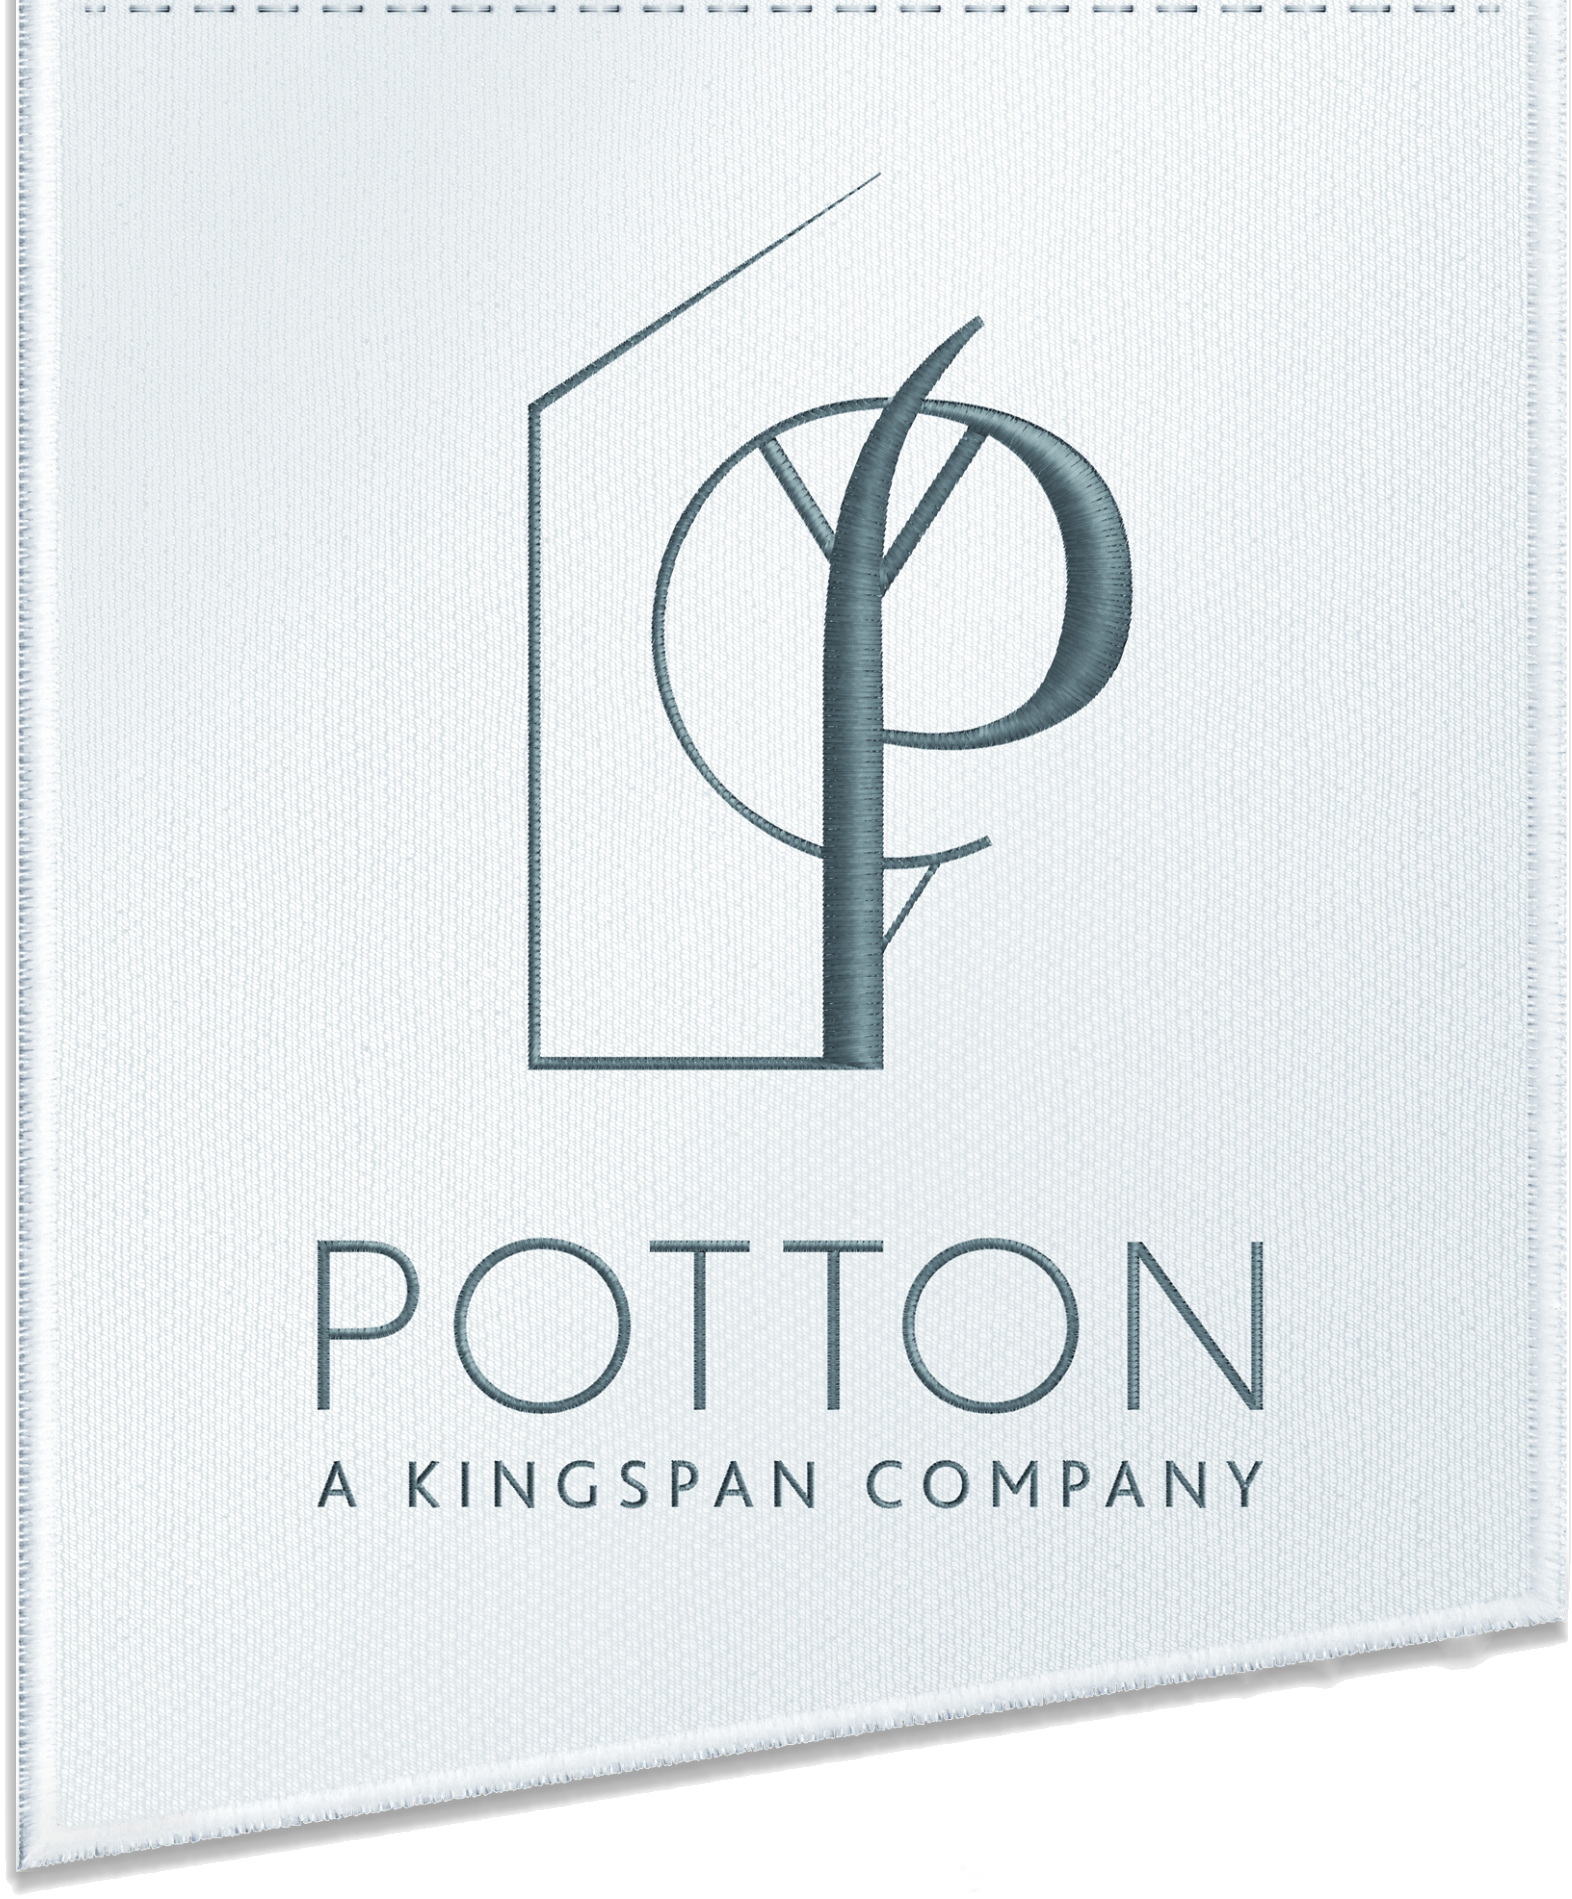 potton